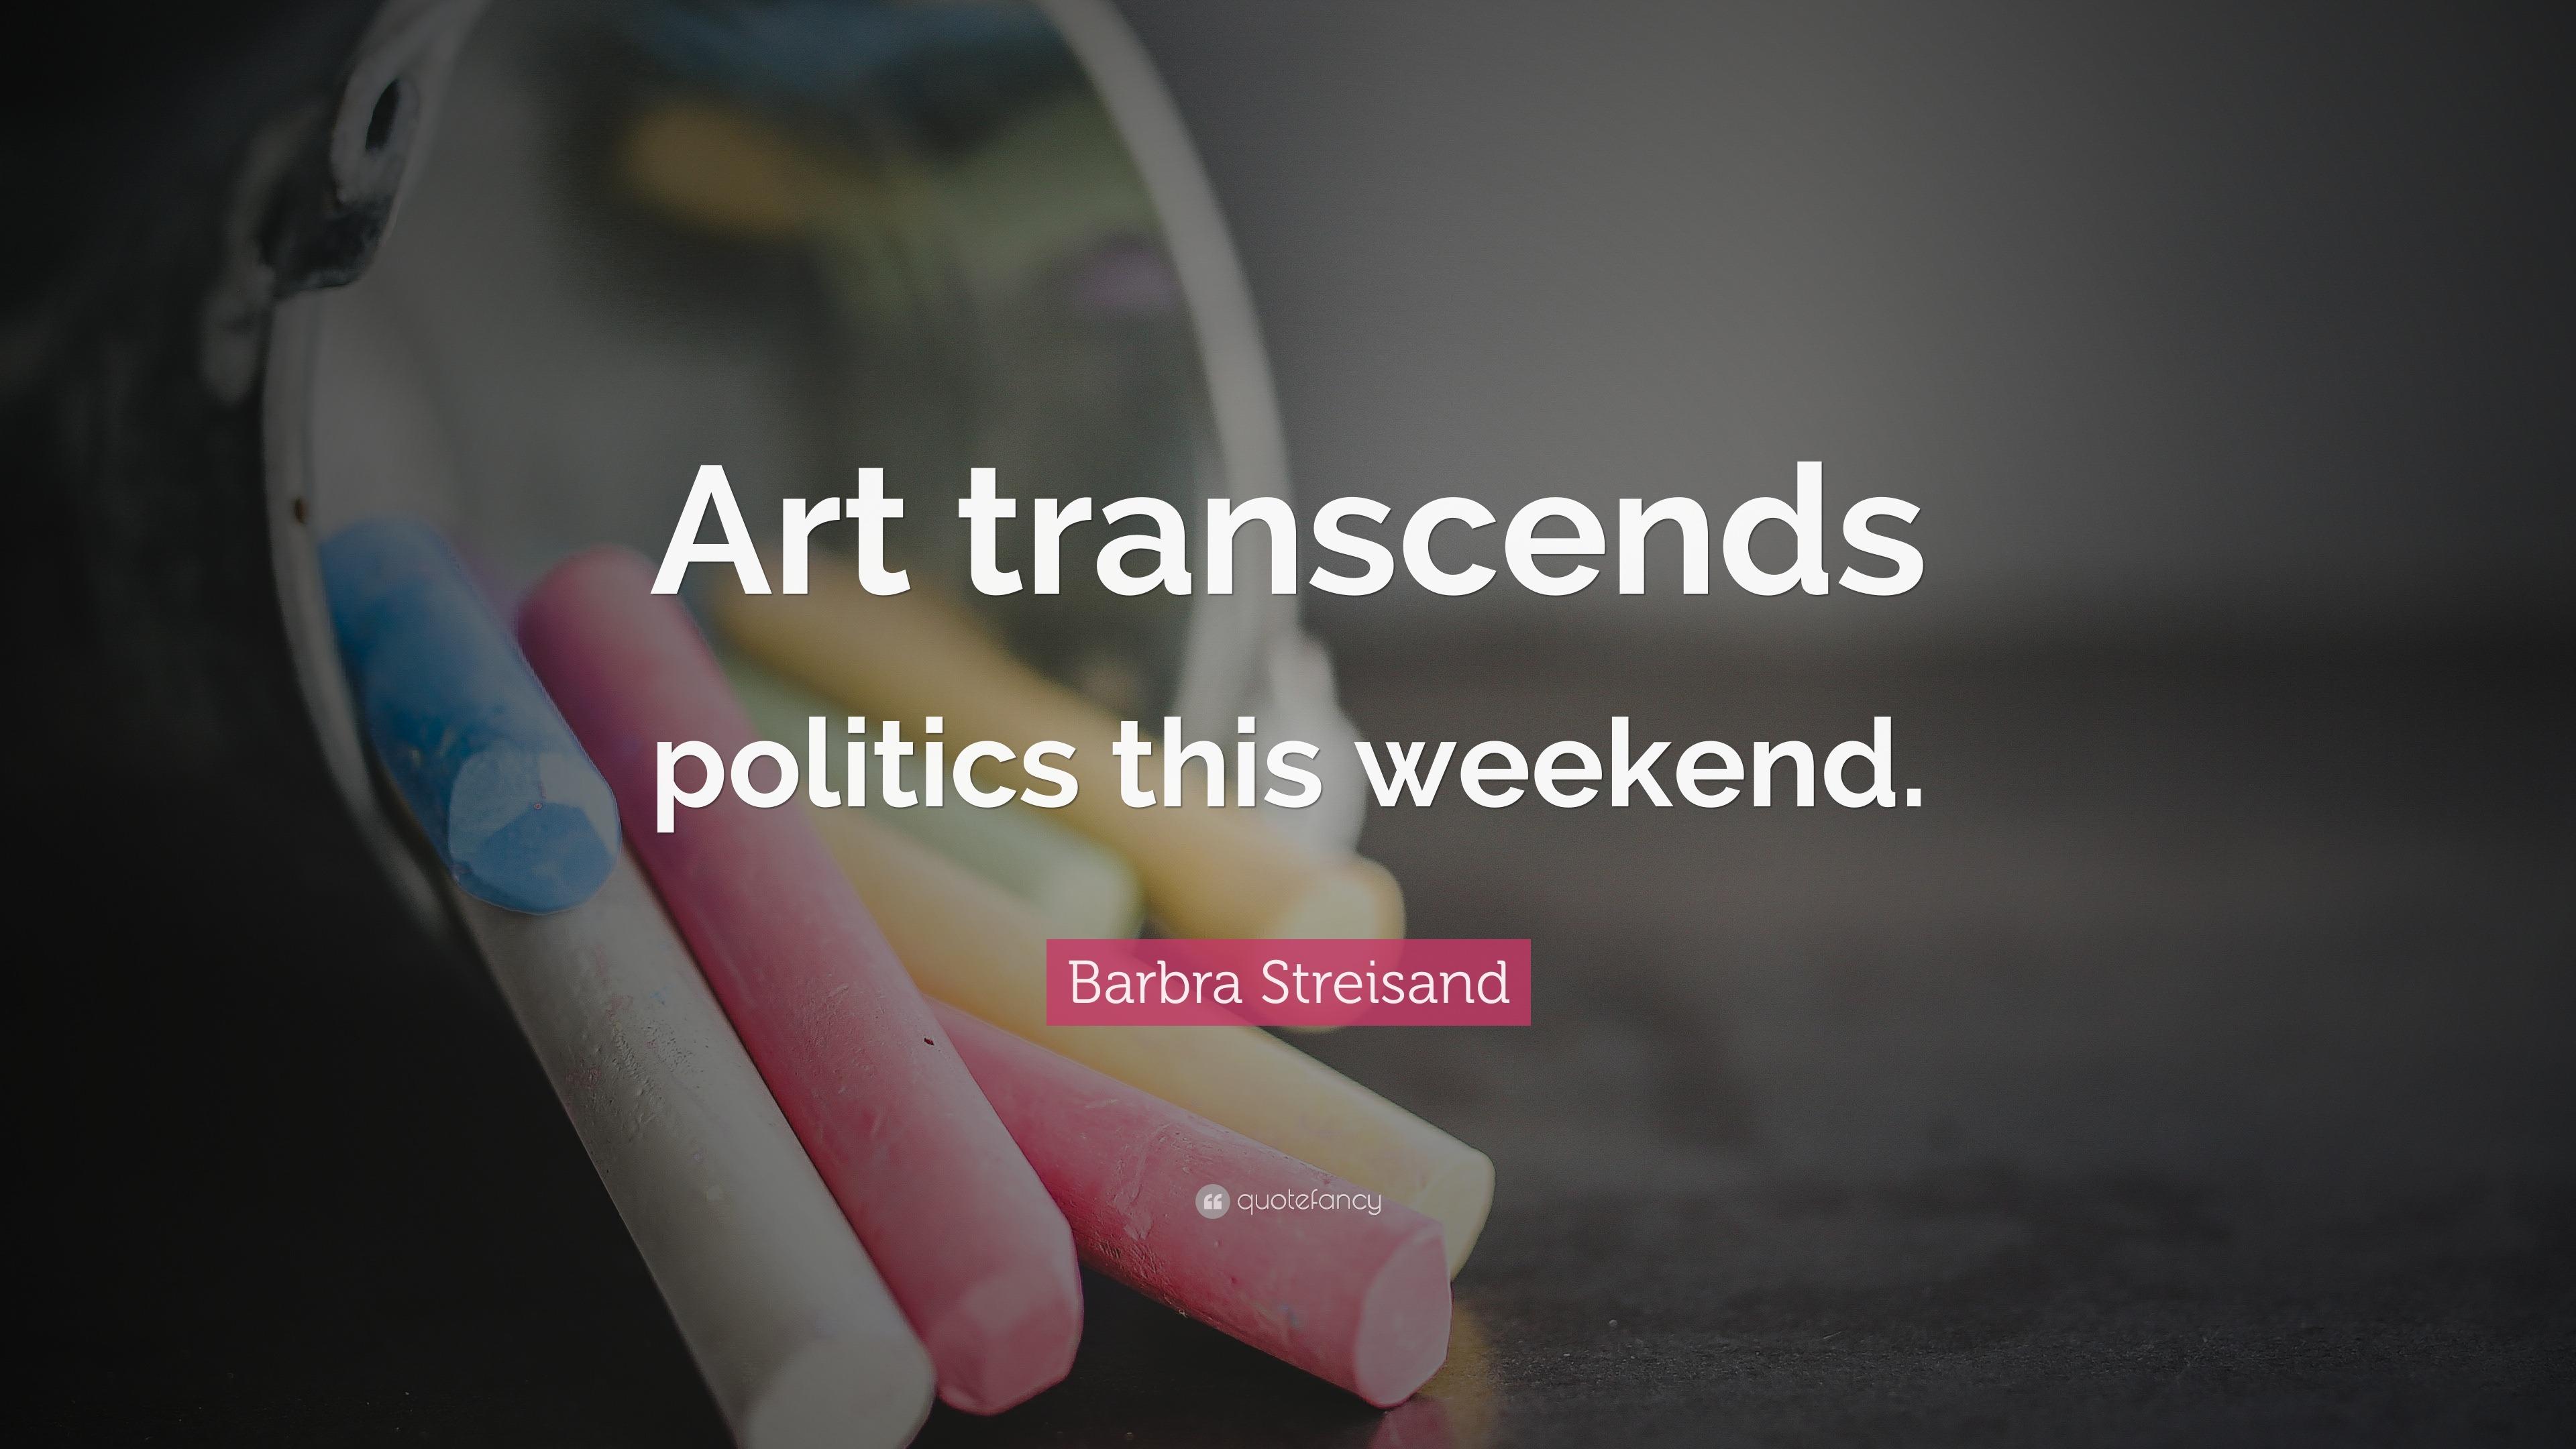 Barbra Streisand Quote Art Transcends Politics This Weekend 7